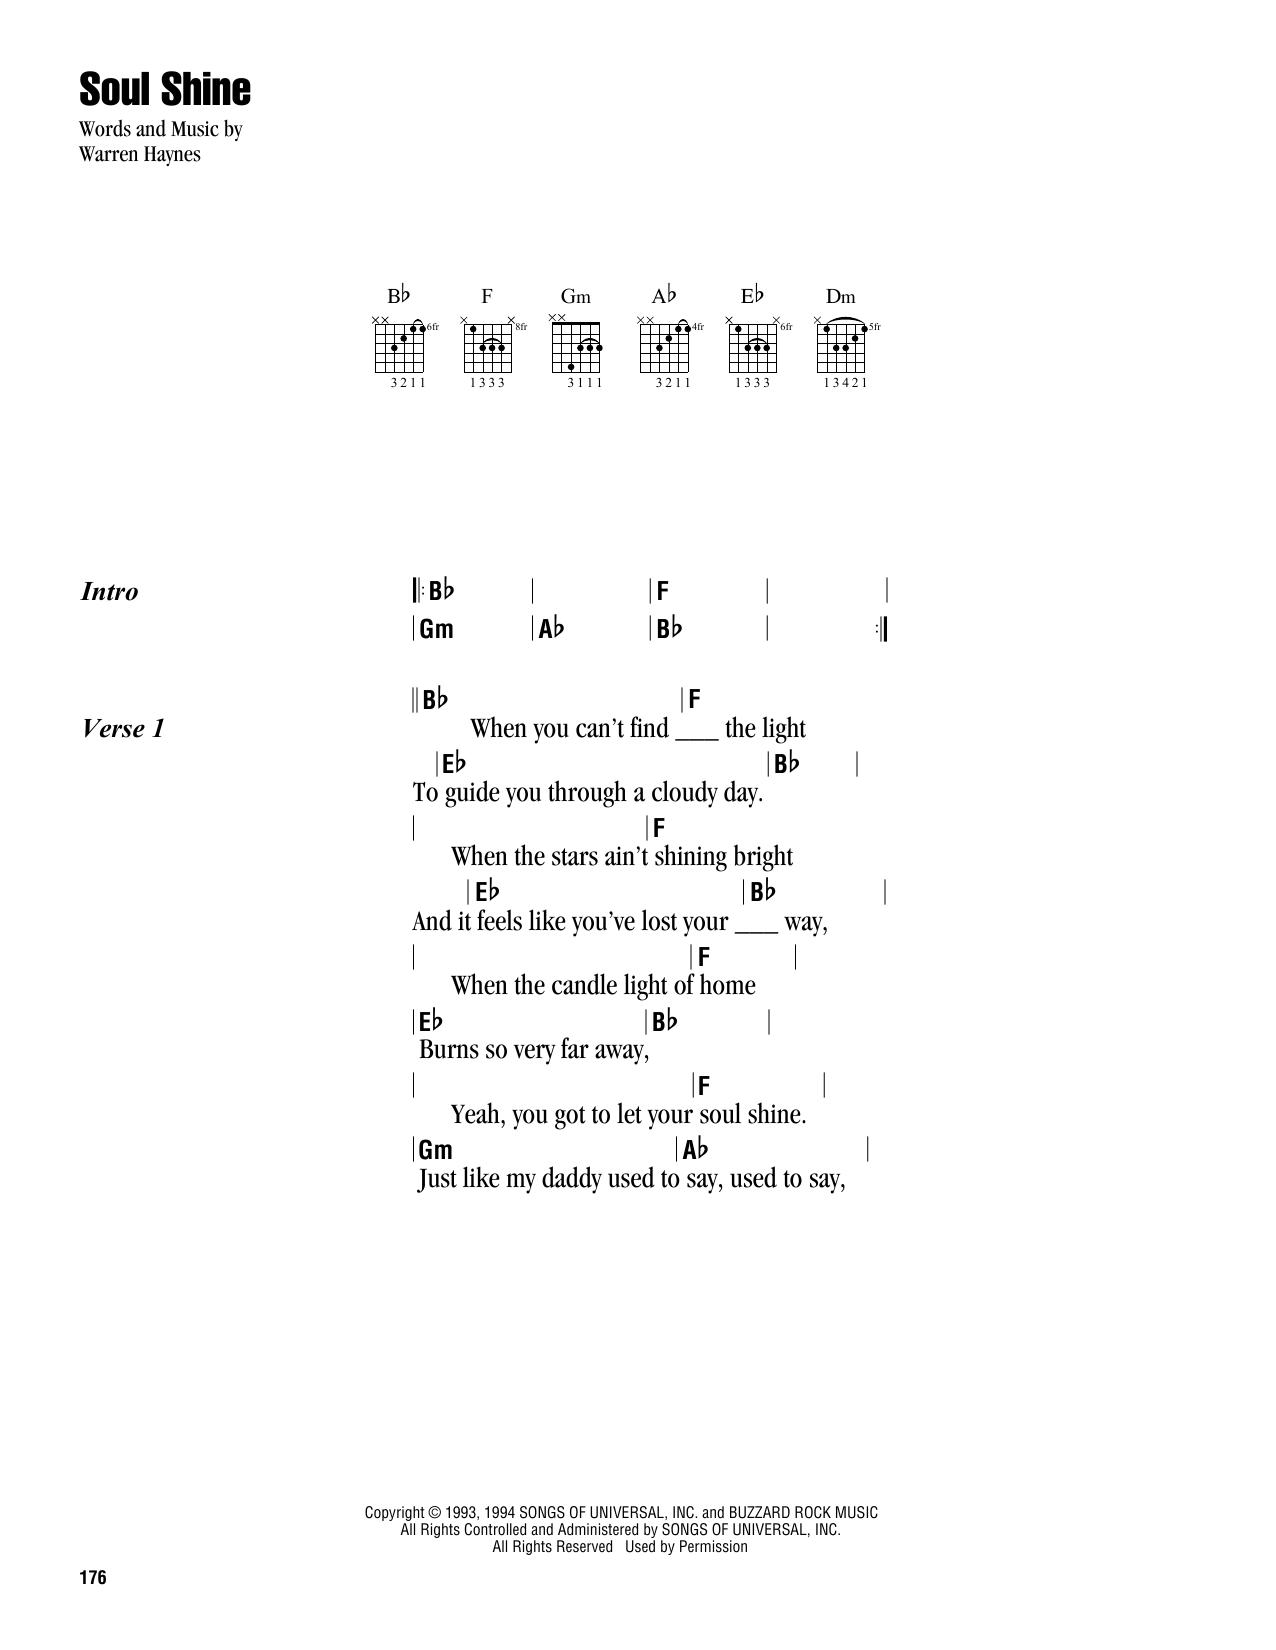 Warren Haynes Soul Shine sheet music notes and chords. Download Printable PDF.